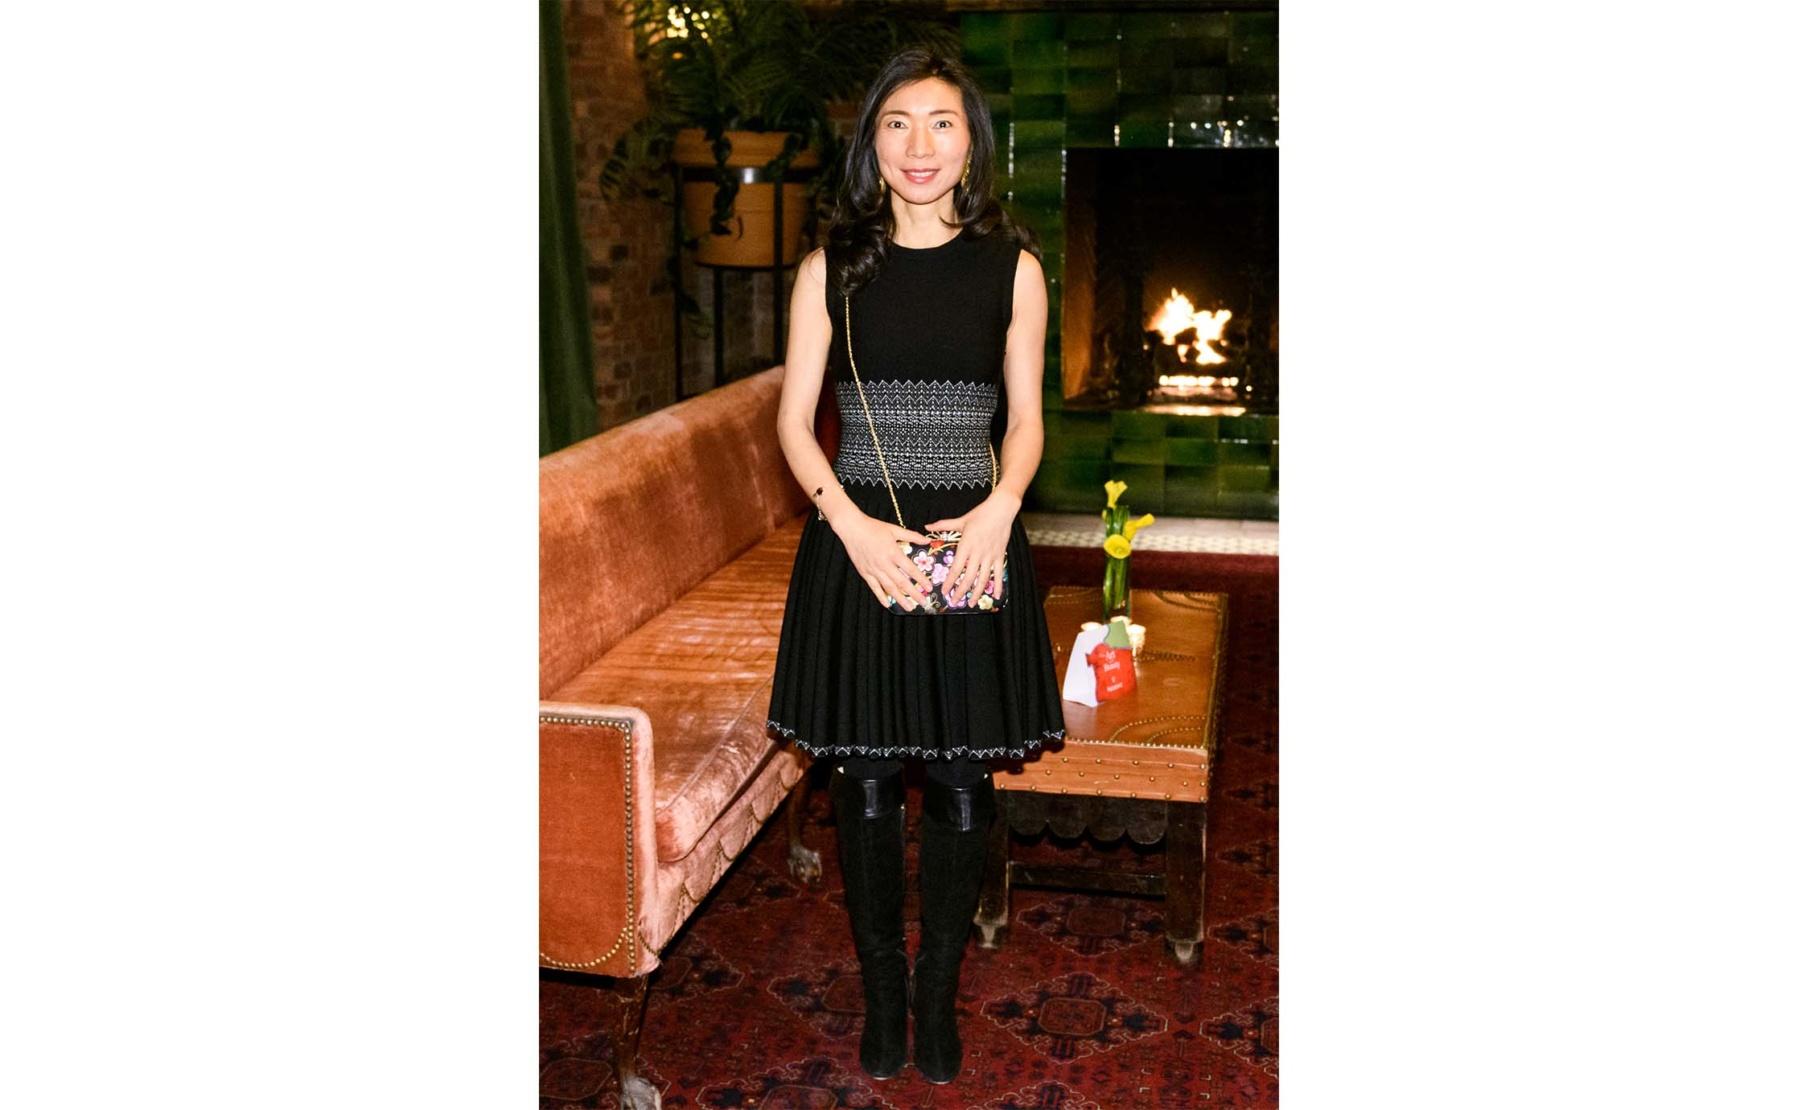 Grace Rong Li